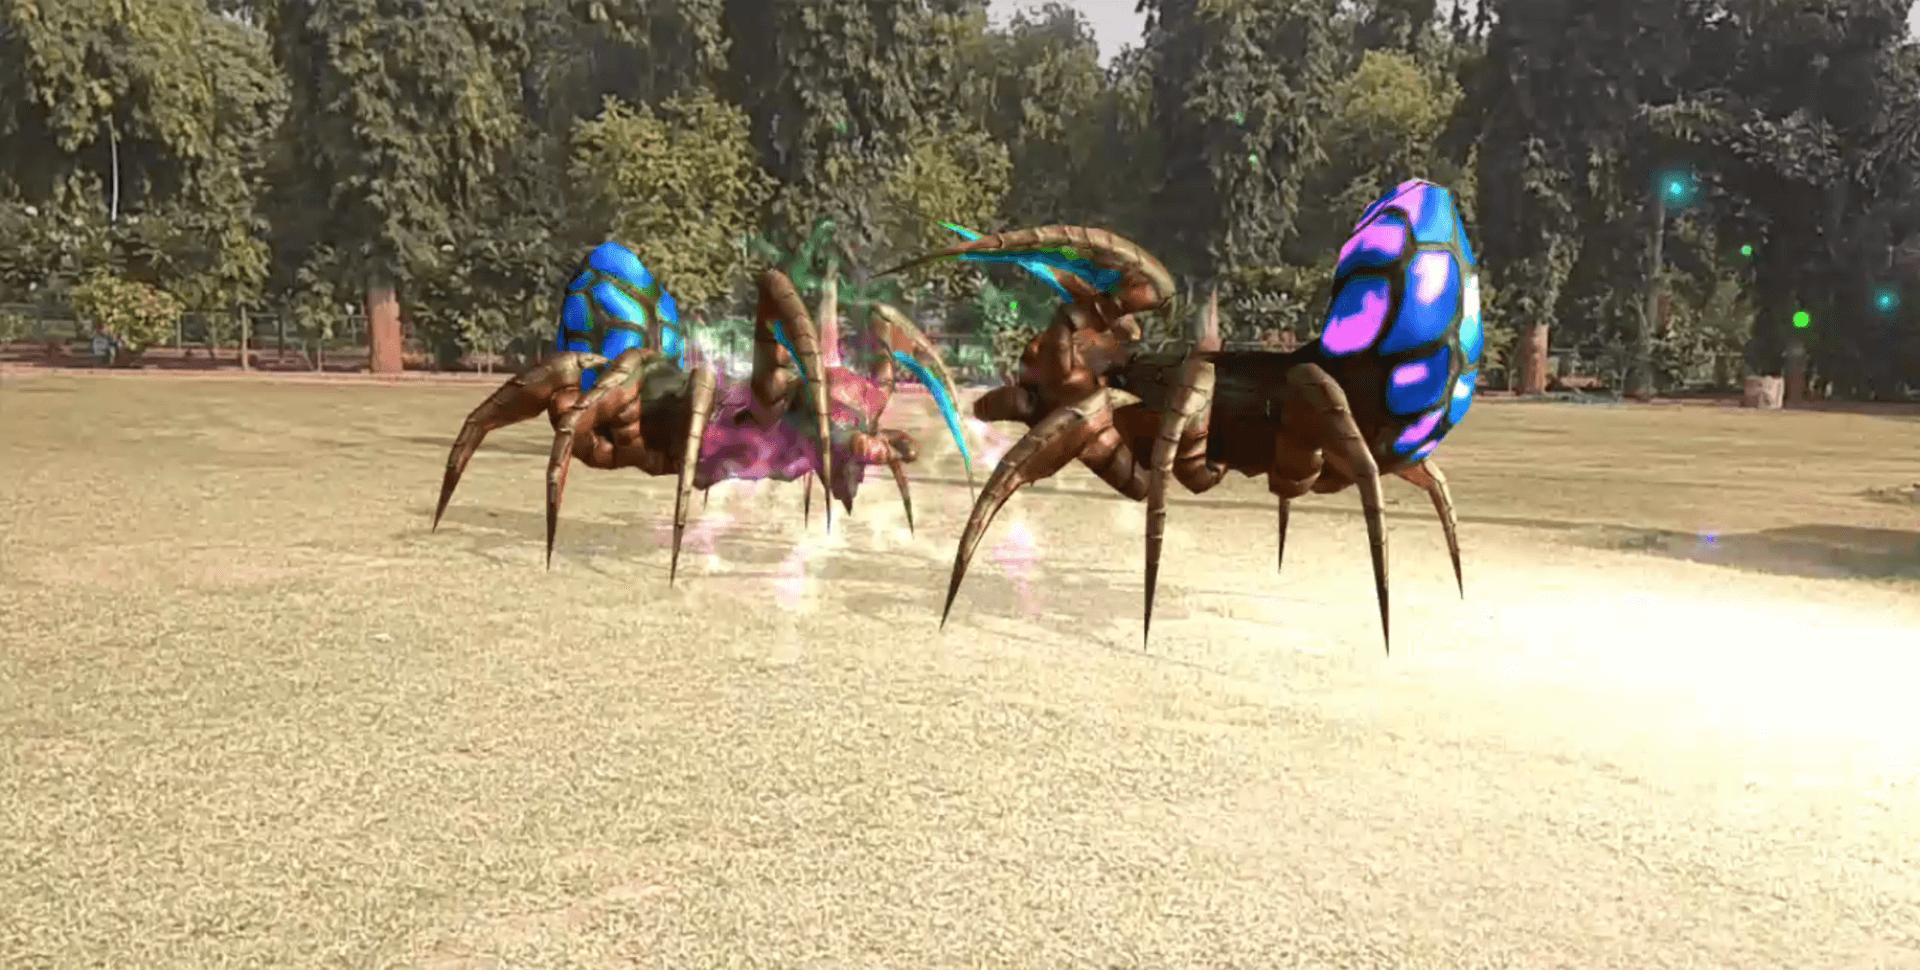 Gigantic spiders are fighting